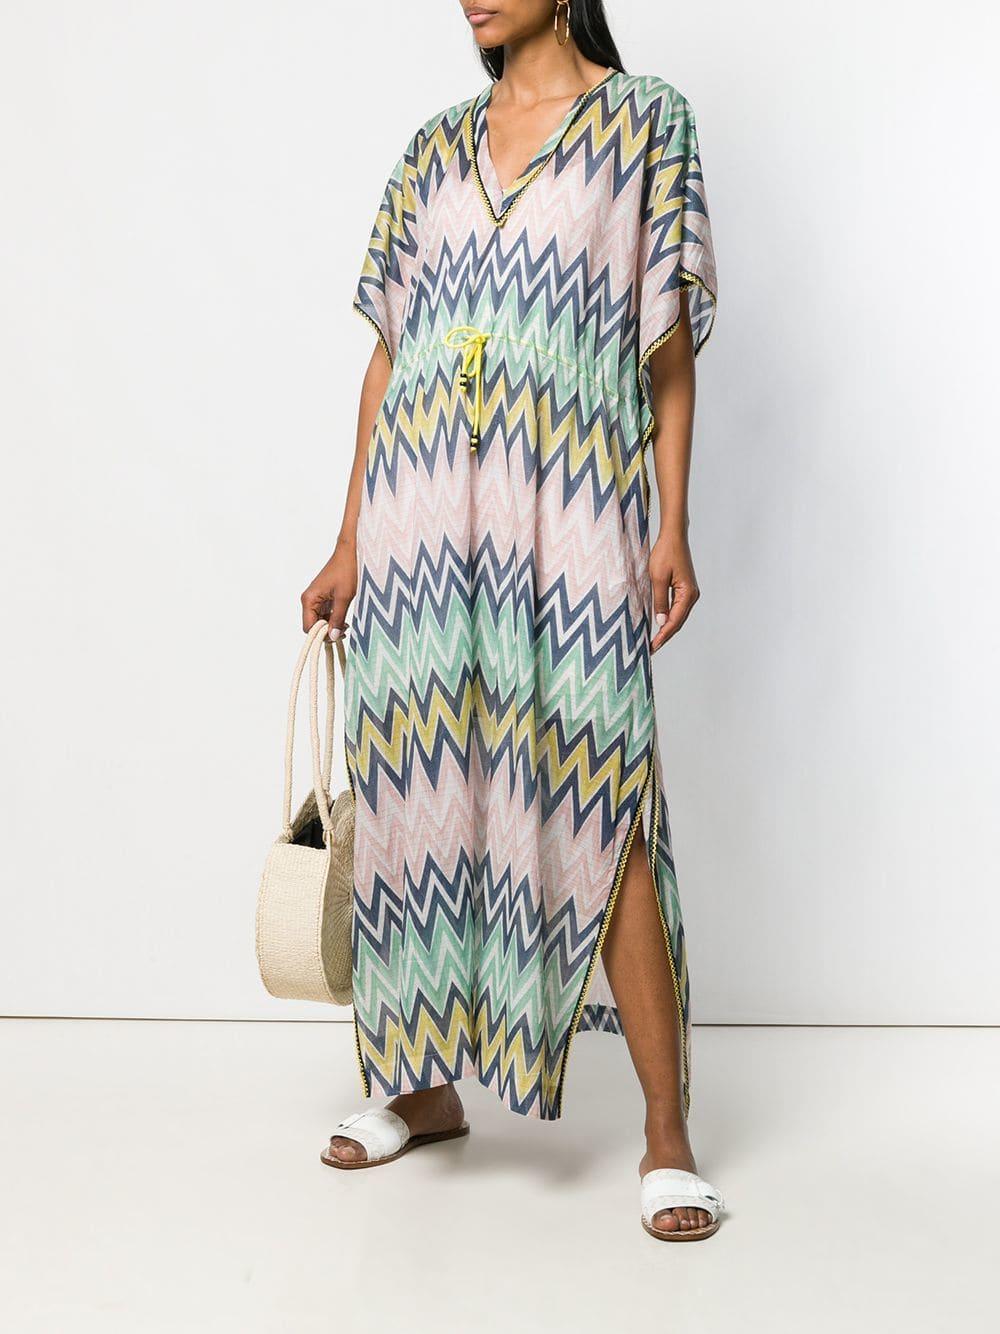 dcfeeafd9cf M Missoni Chevron Printed Maxi Dress in Green - Lyst